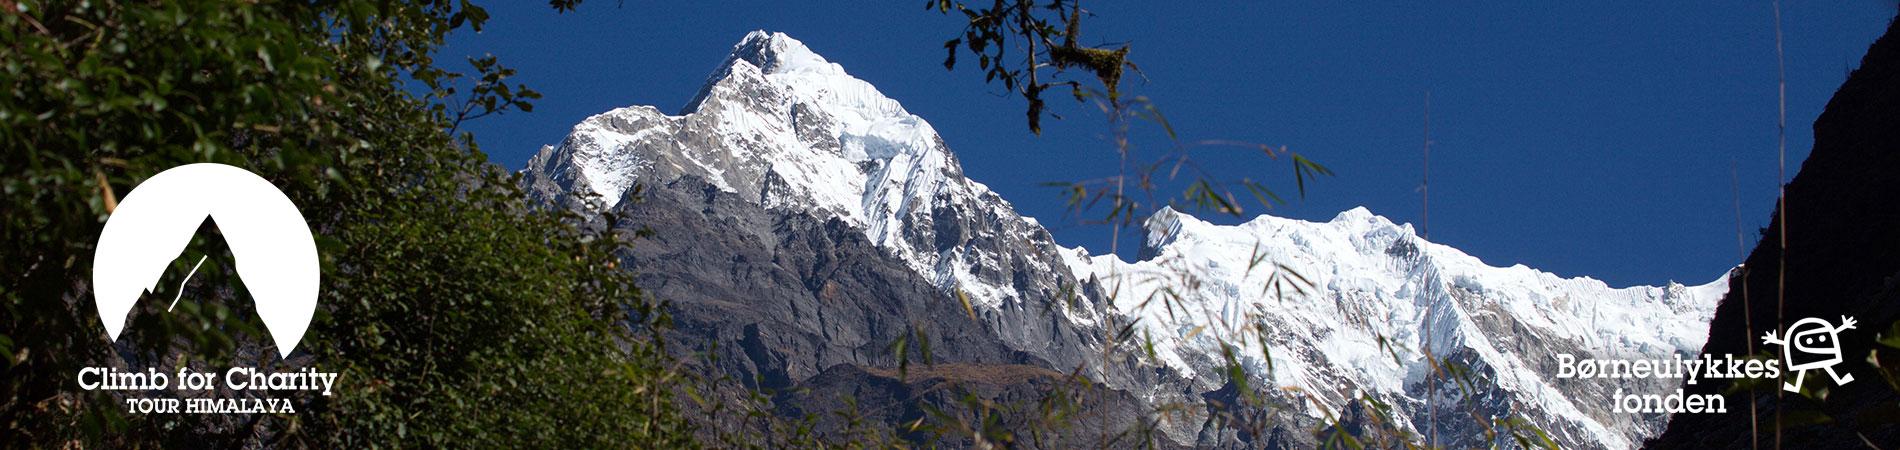 Himalaya/langtang